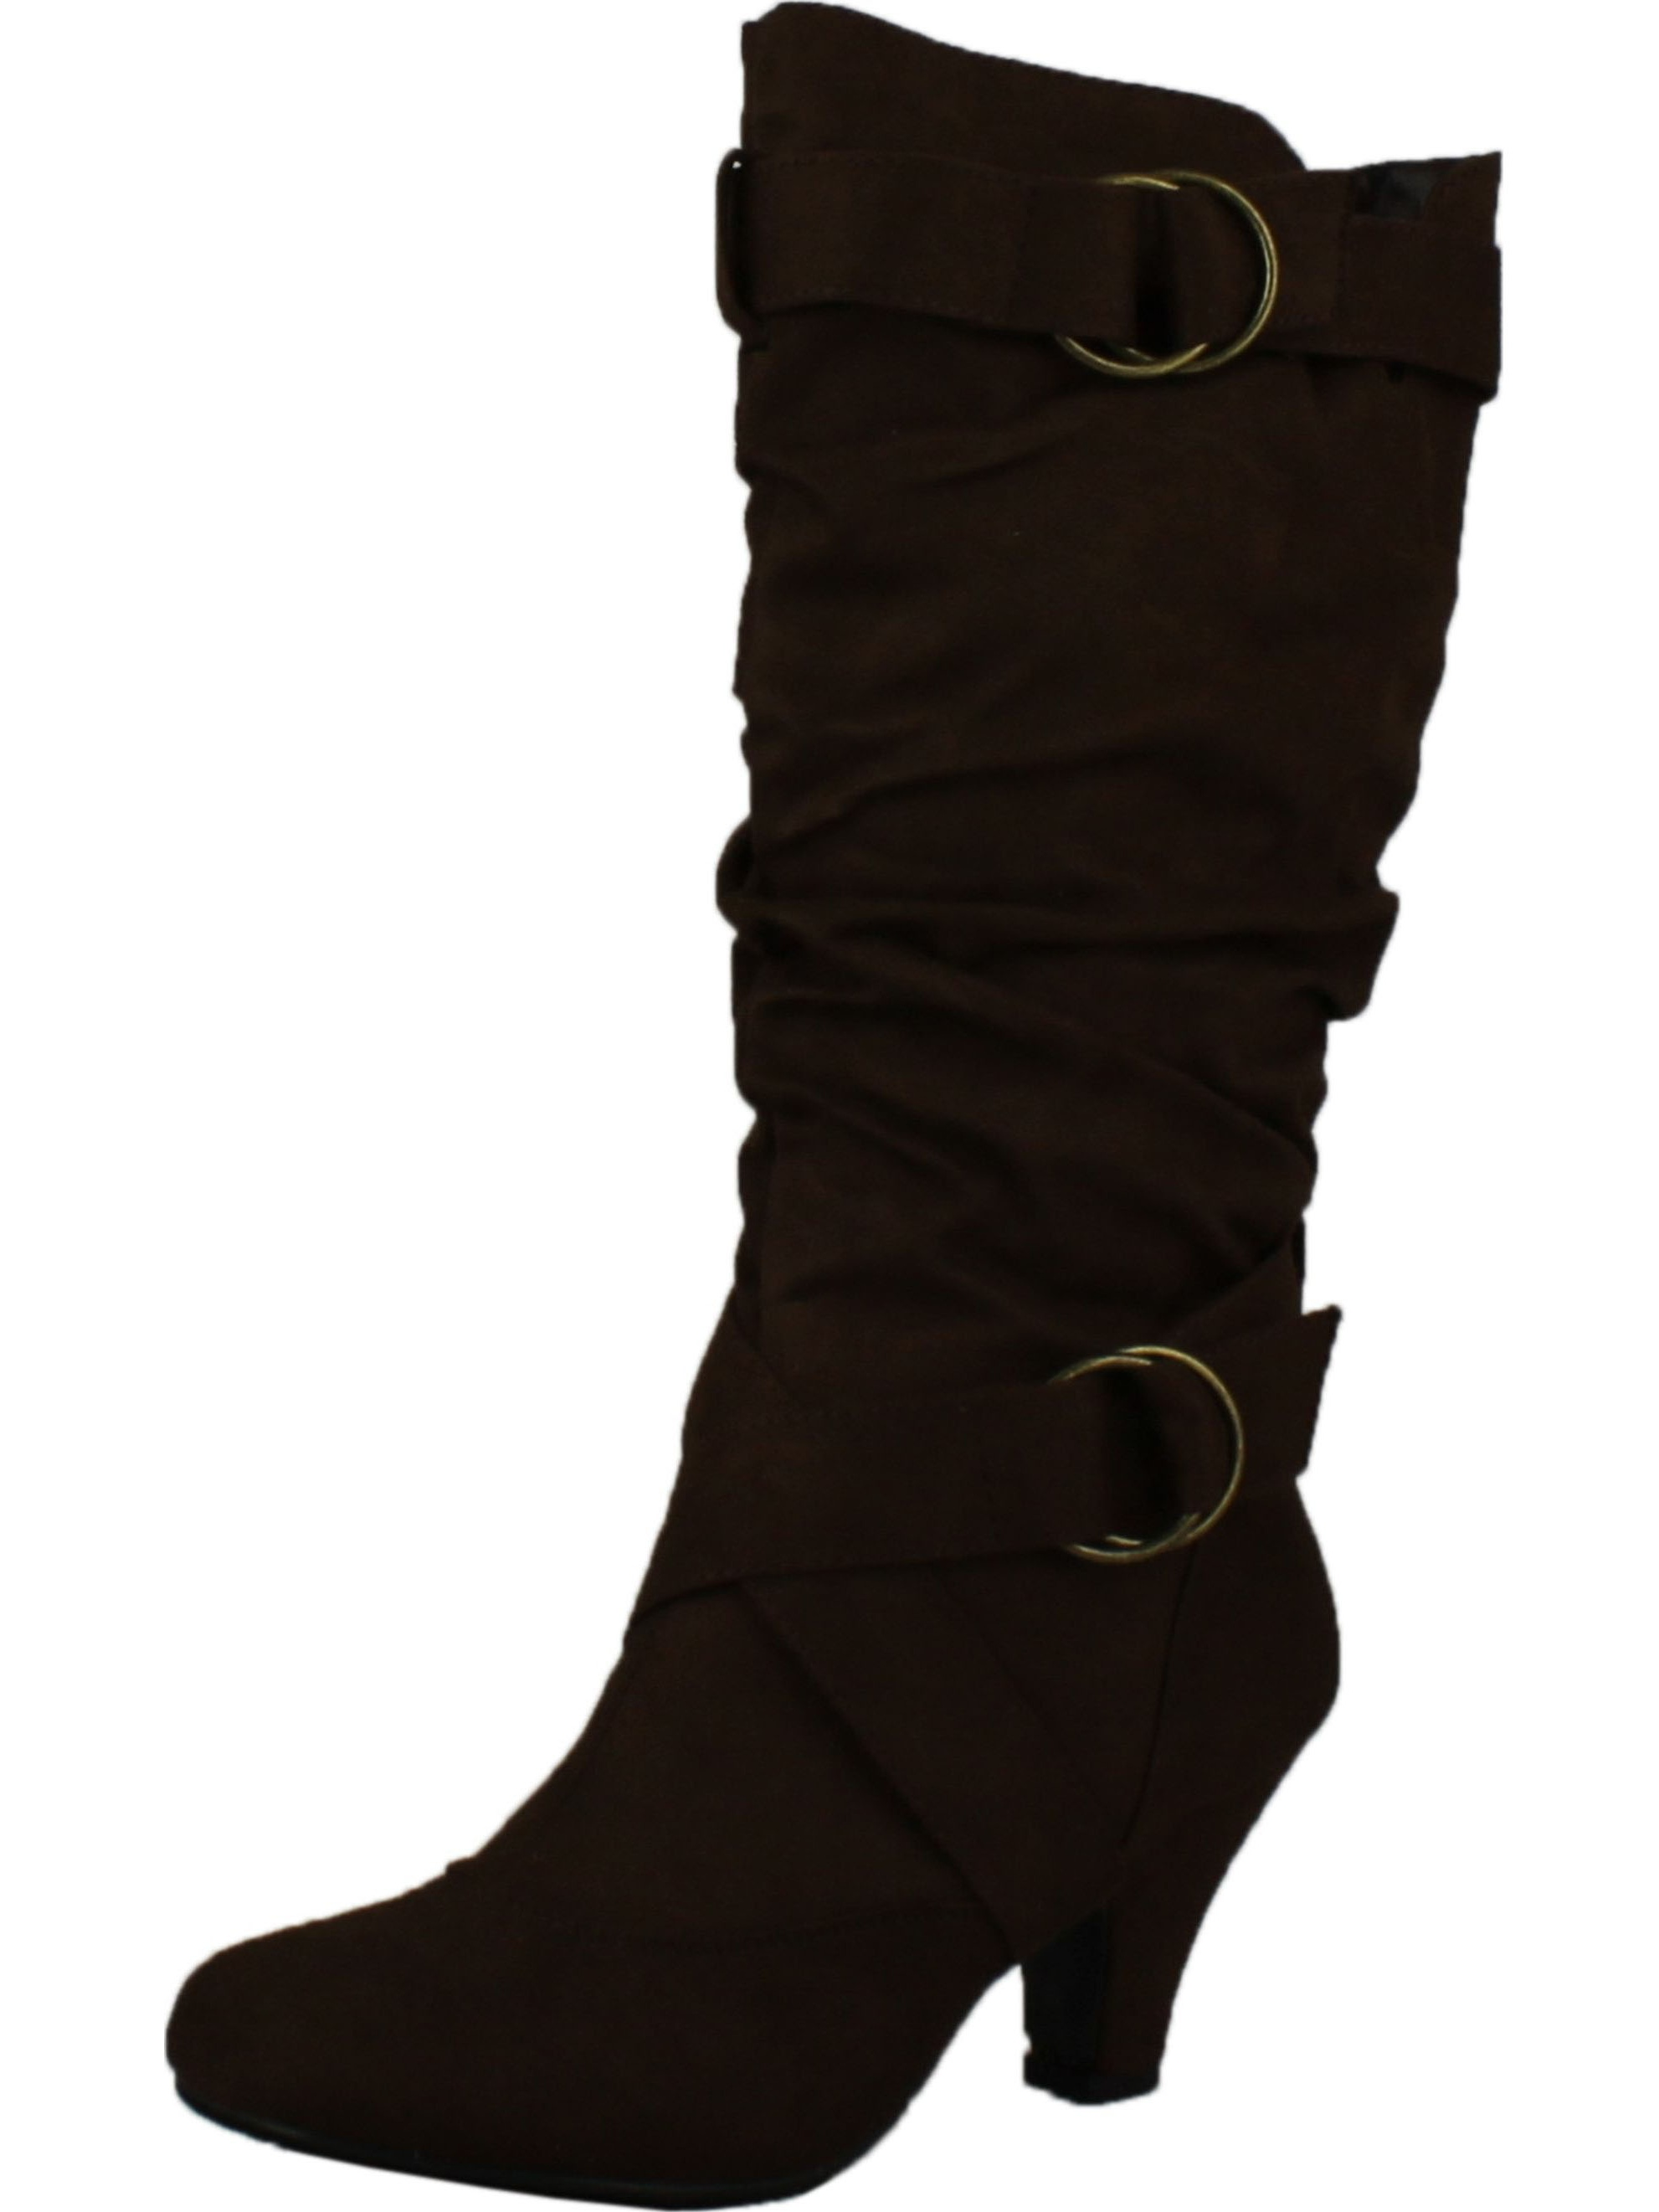 Maggie-38 Women Knee High Kitty Heels Wide Shaft Boots